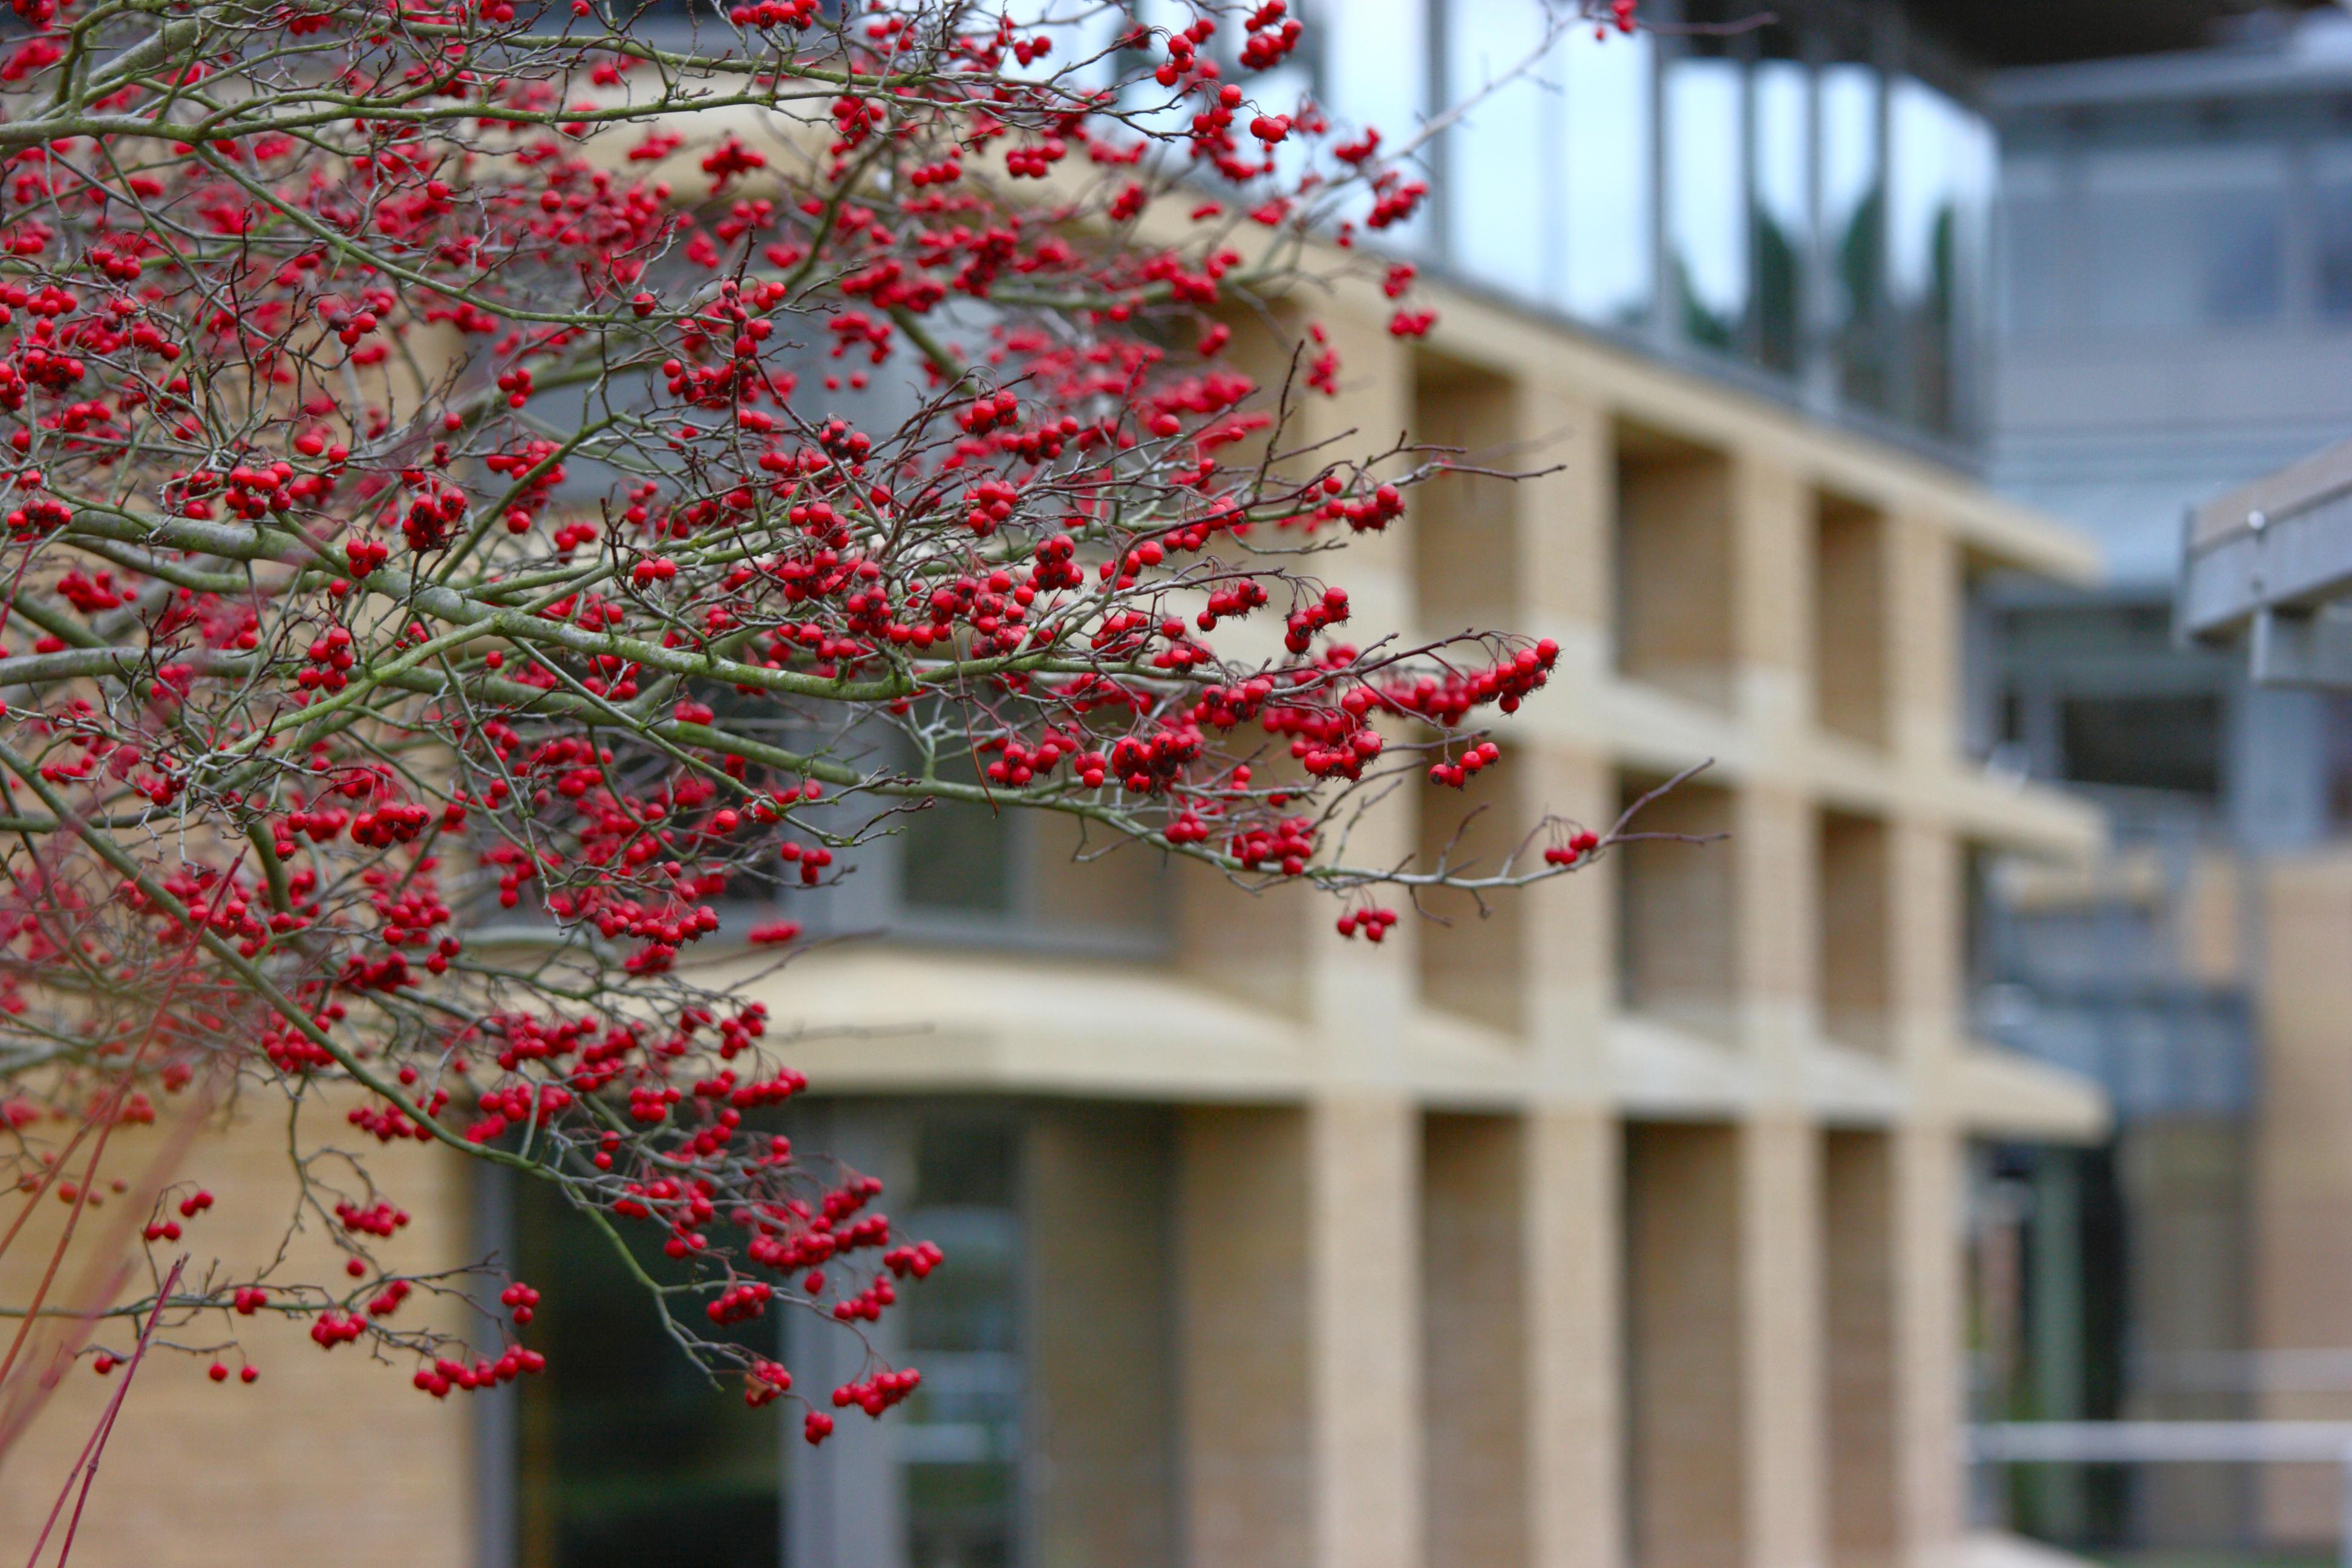 Centre for Mathematical Sciences, Cambridge